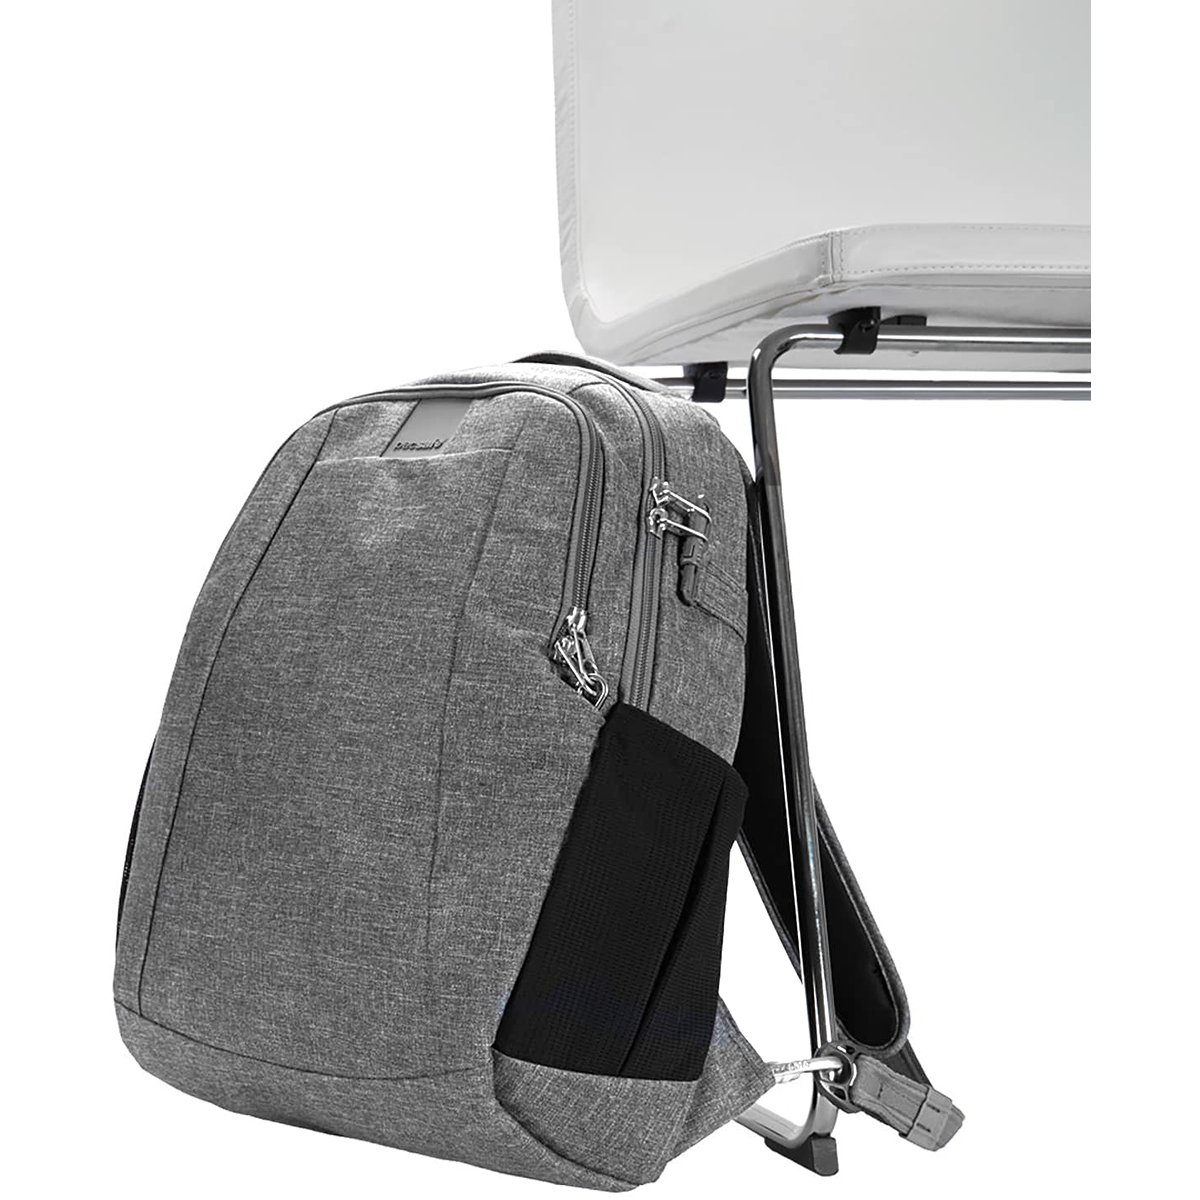 PacSafe-MetroSafe-LS350-Anti-Theft-15L-Backpack miniature 12